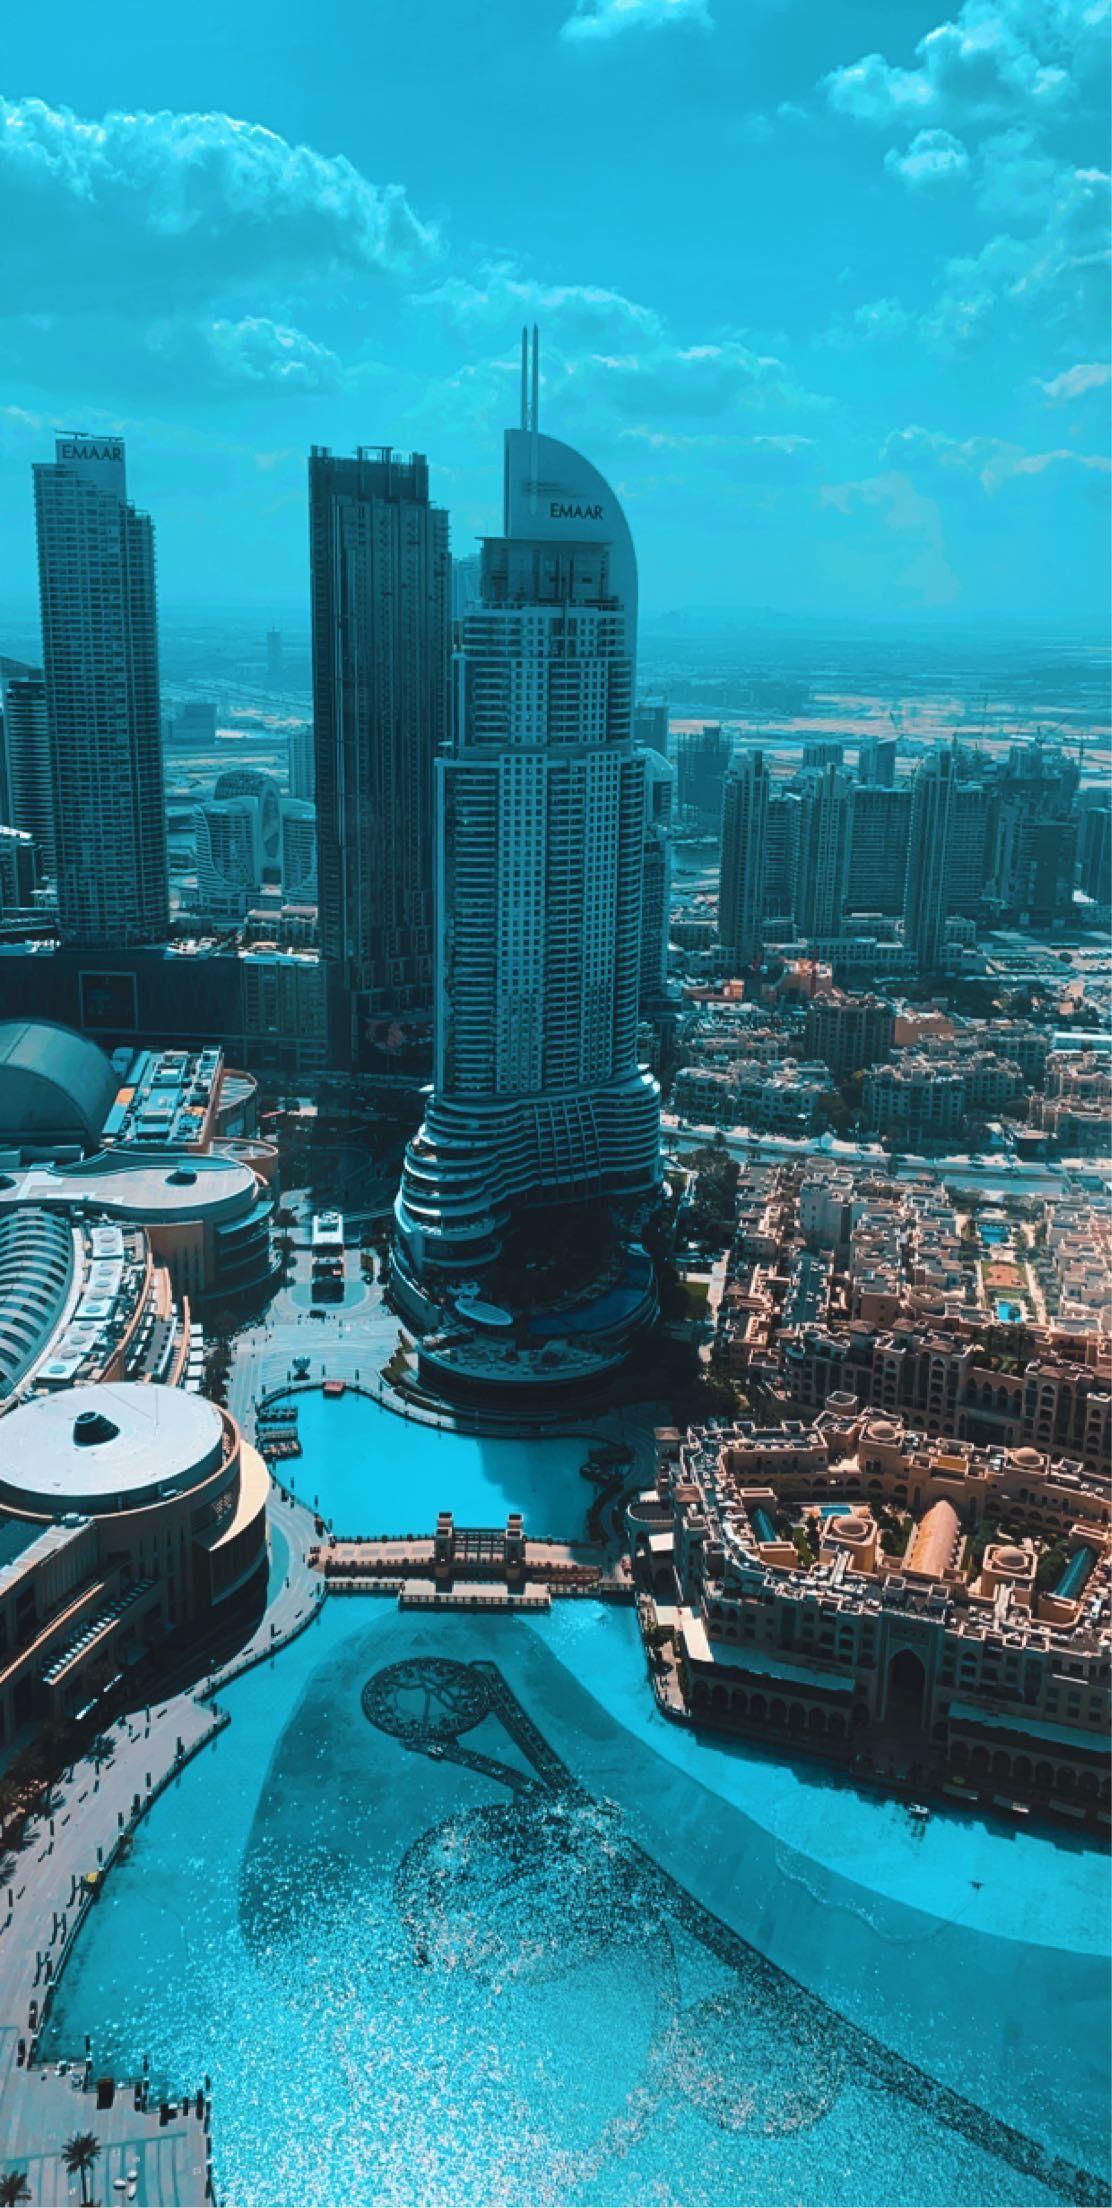 Dubai Photography Photo تصويري سناب تصميم دبي Dubai Outdoor River